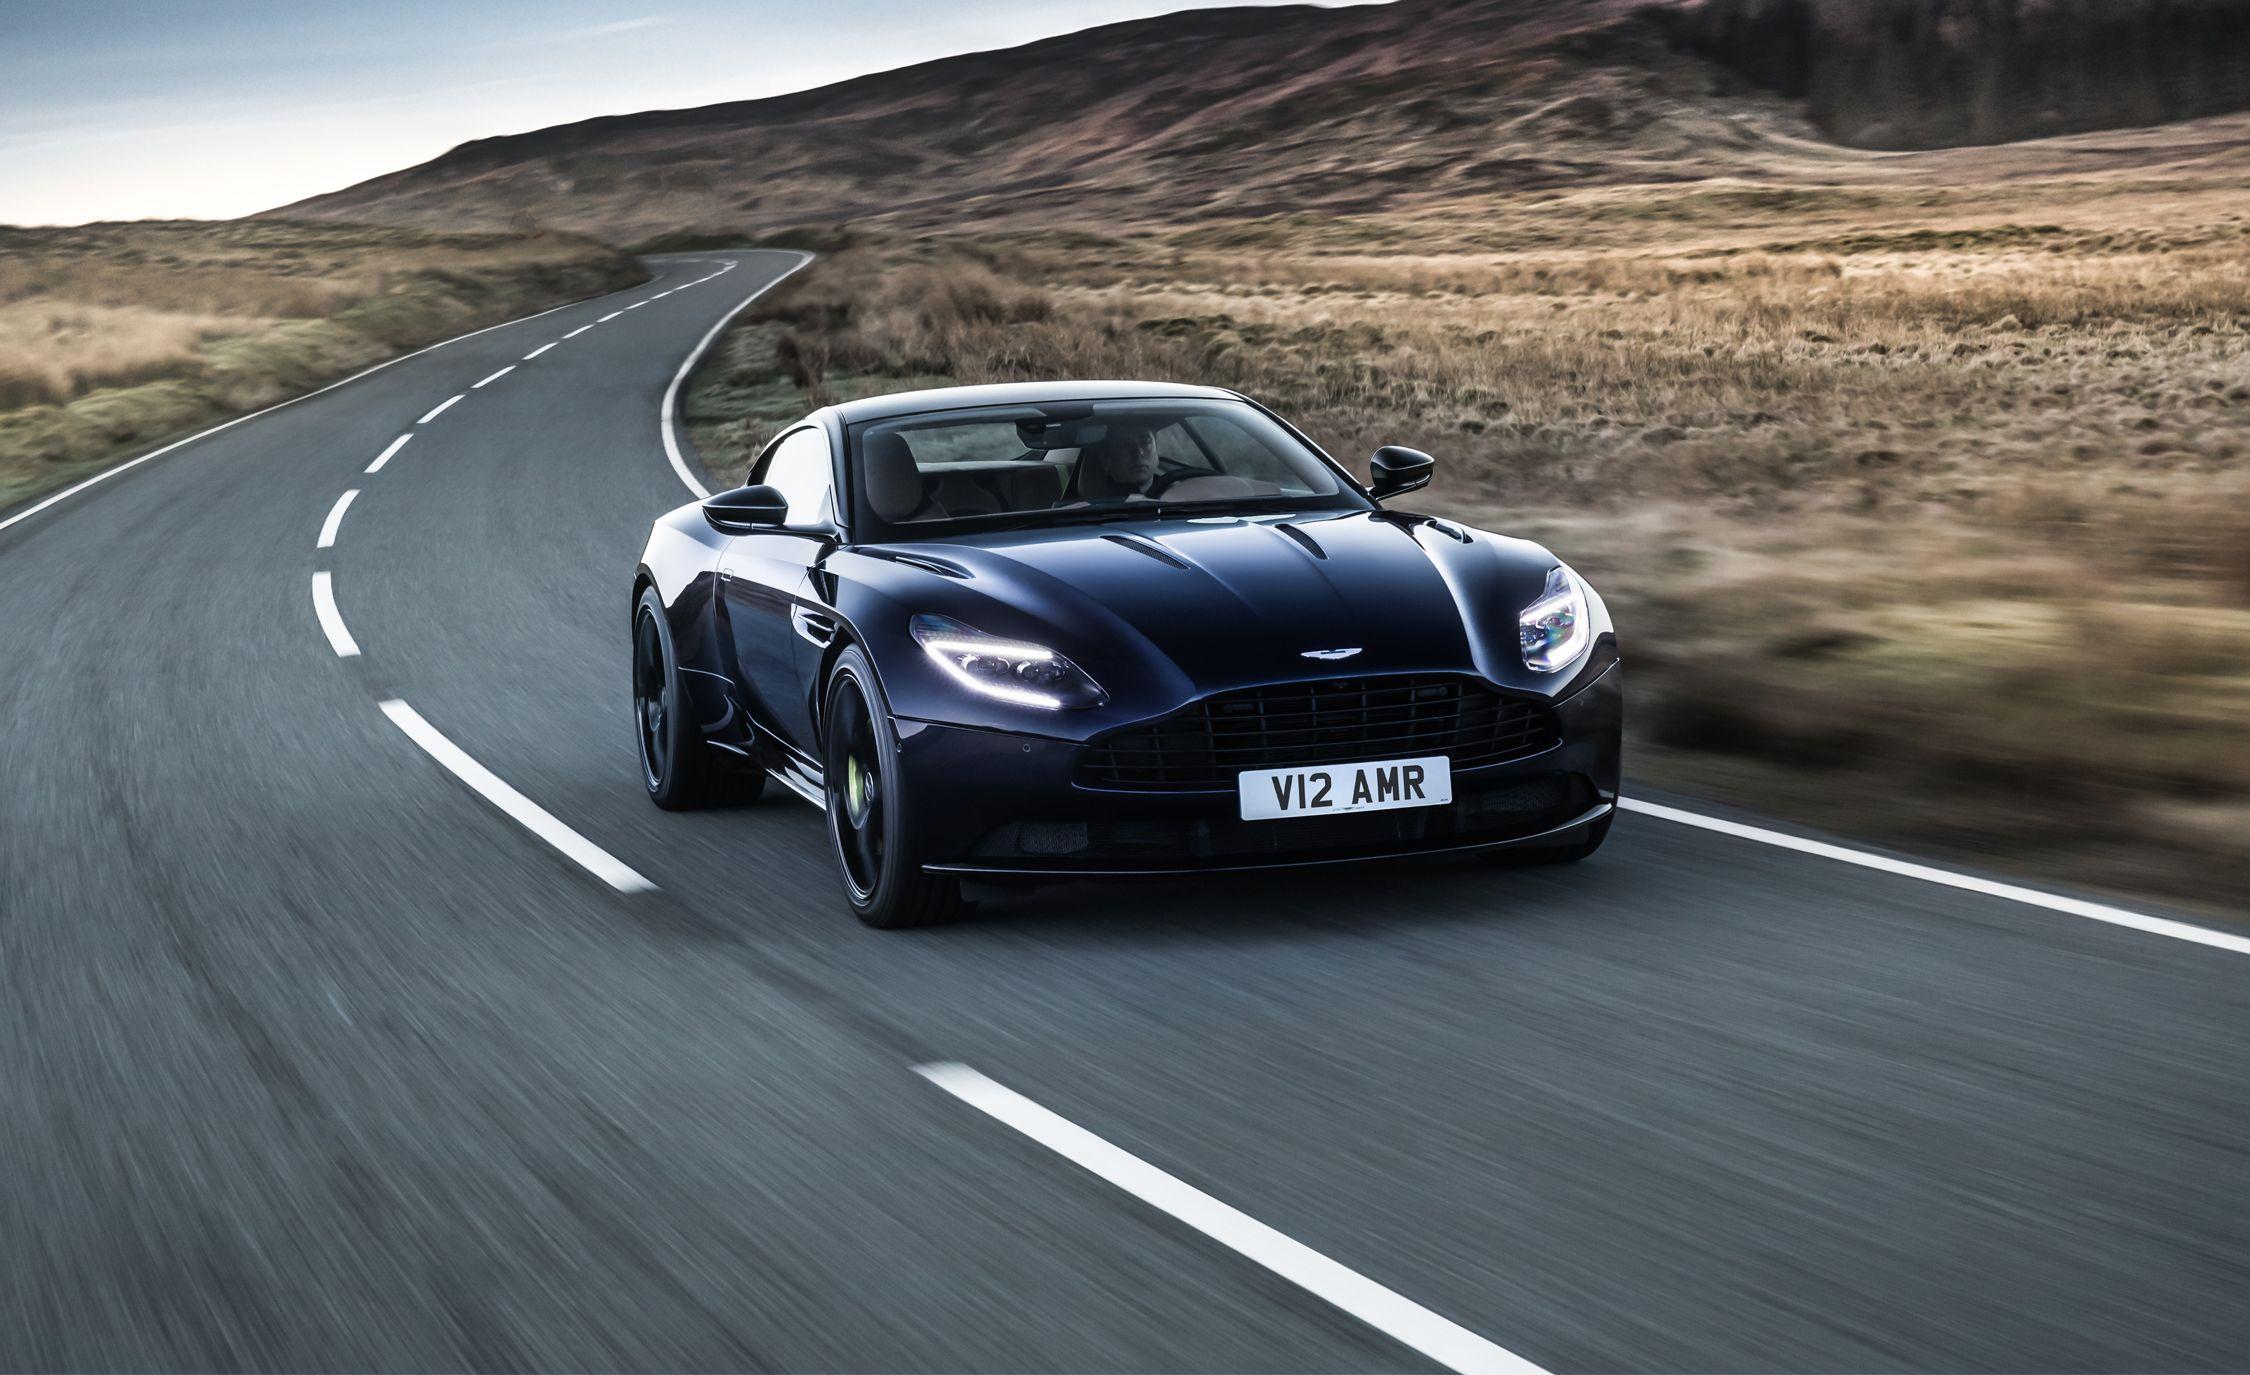 2019 Aston Martin Db11 Amr A 630 Hp V 12 Stunner News Car And Driver